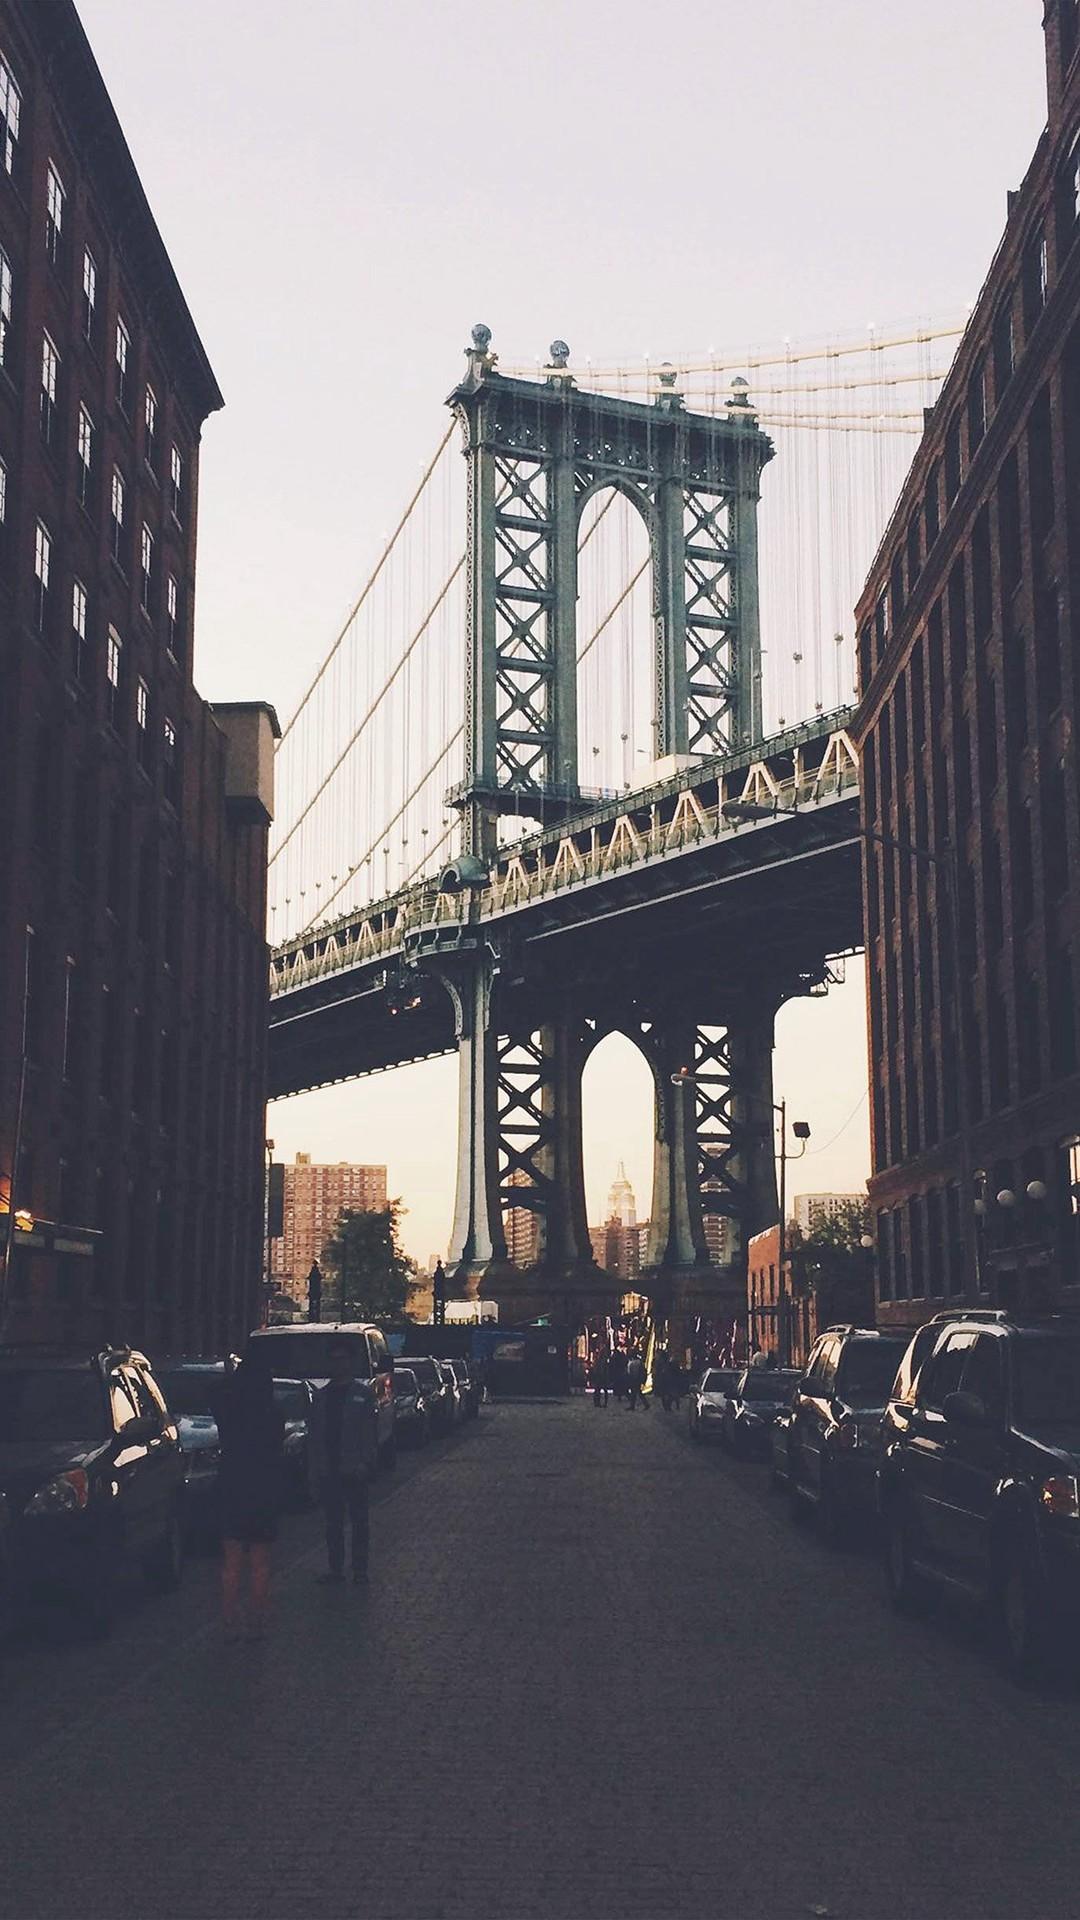 1920x1080 Un Jour Jirai A New York Avec Toi